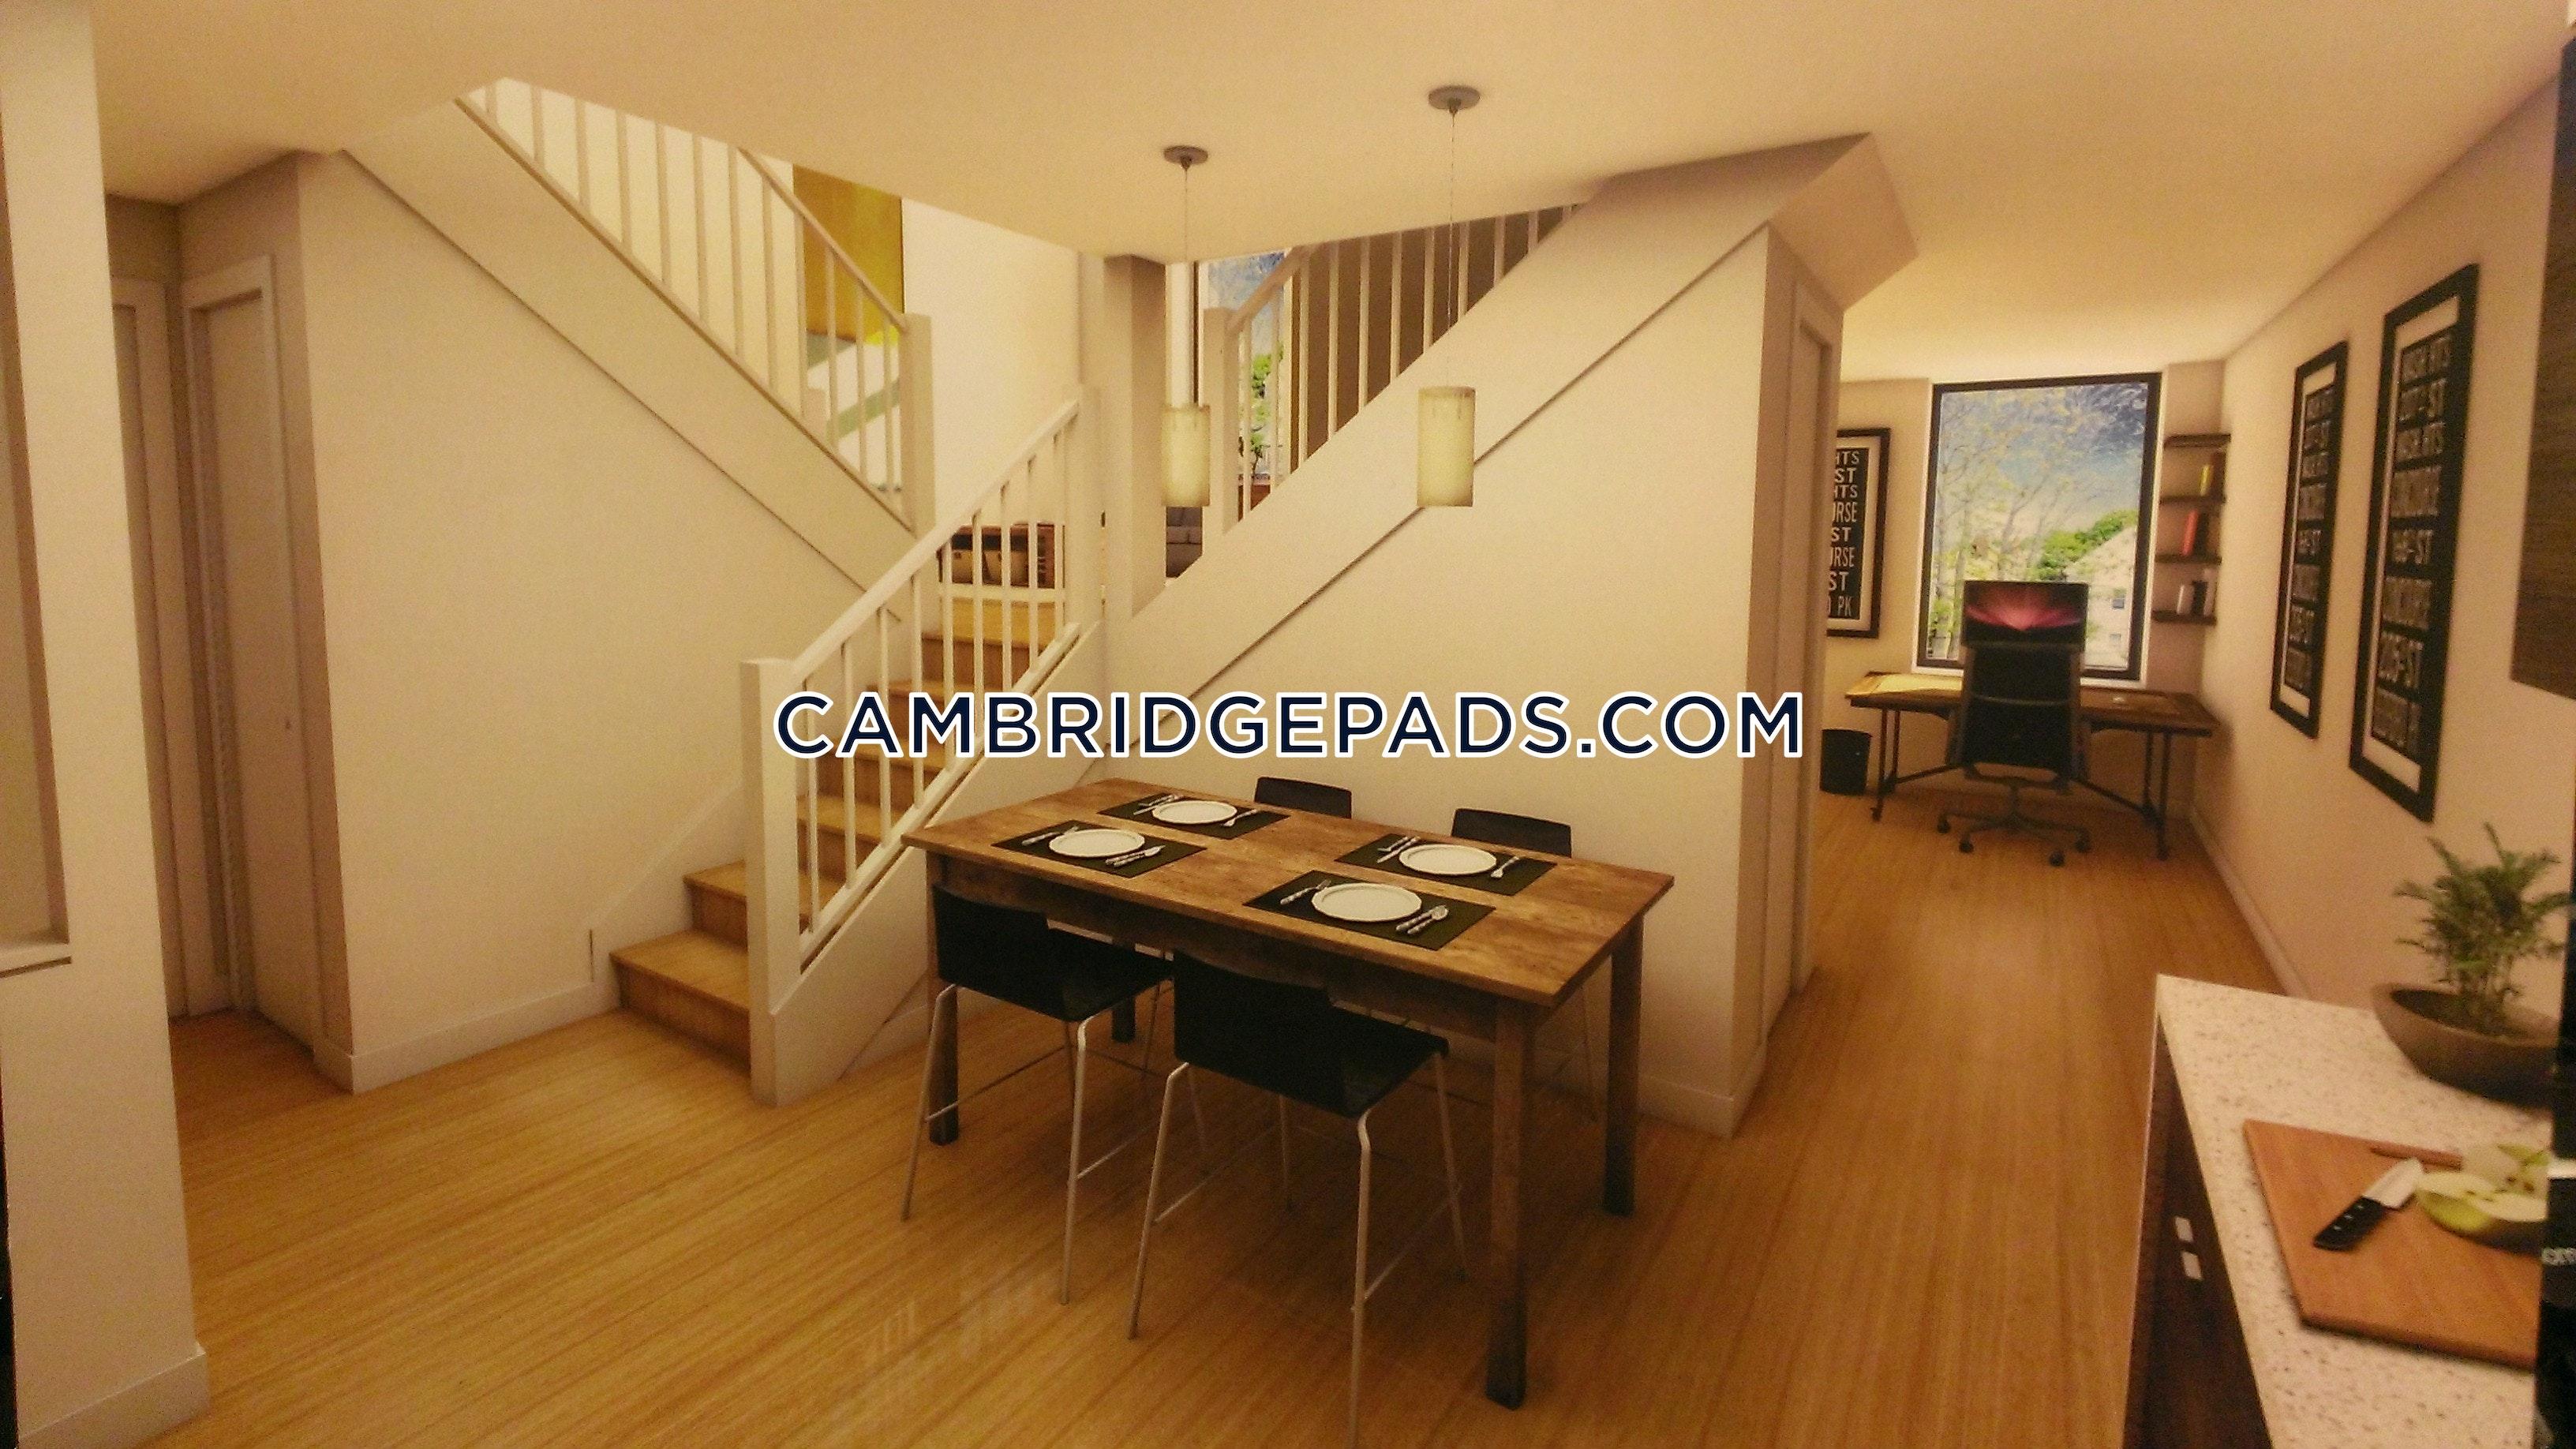 Rindge Ave. CAMBRIDGE - PORTER SQUARE